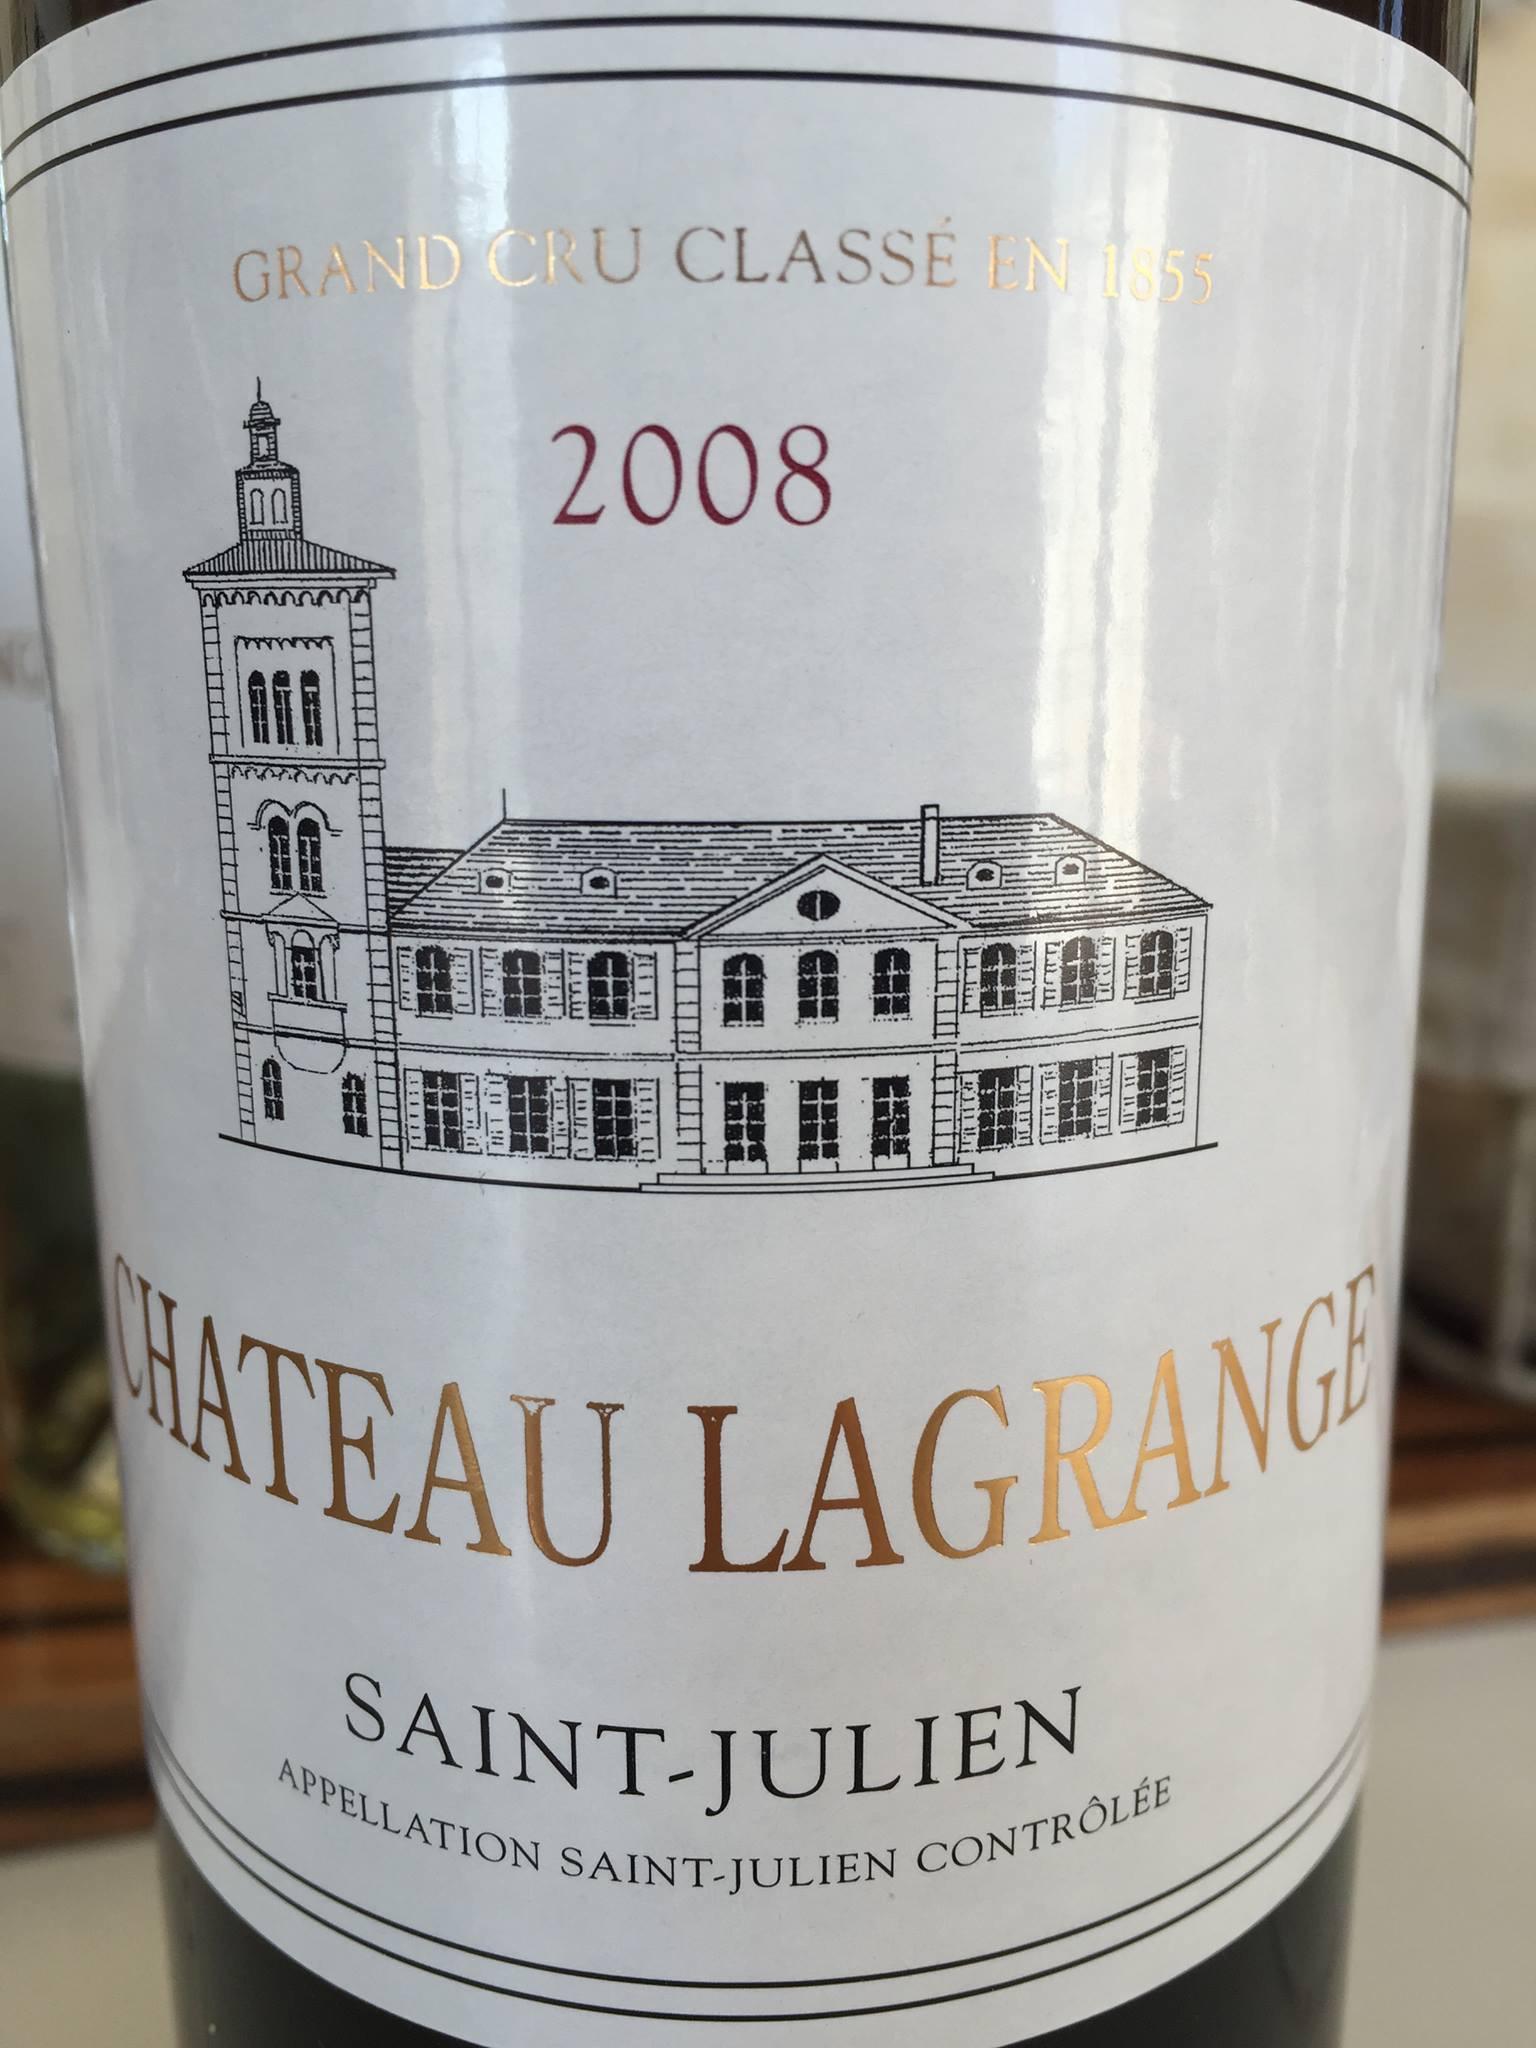 Château Lagrange 2008 – Saint-Julien, Grand Cru Classé